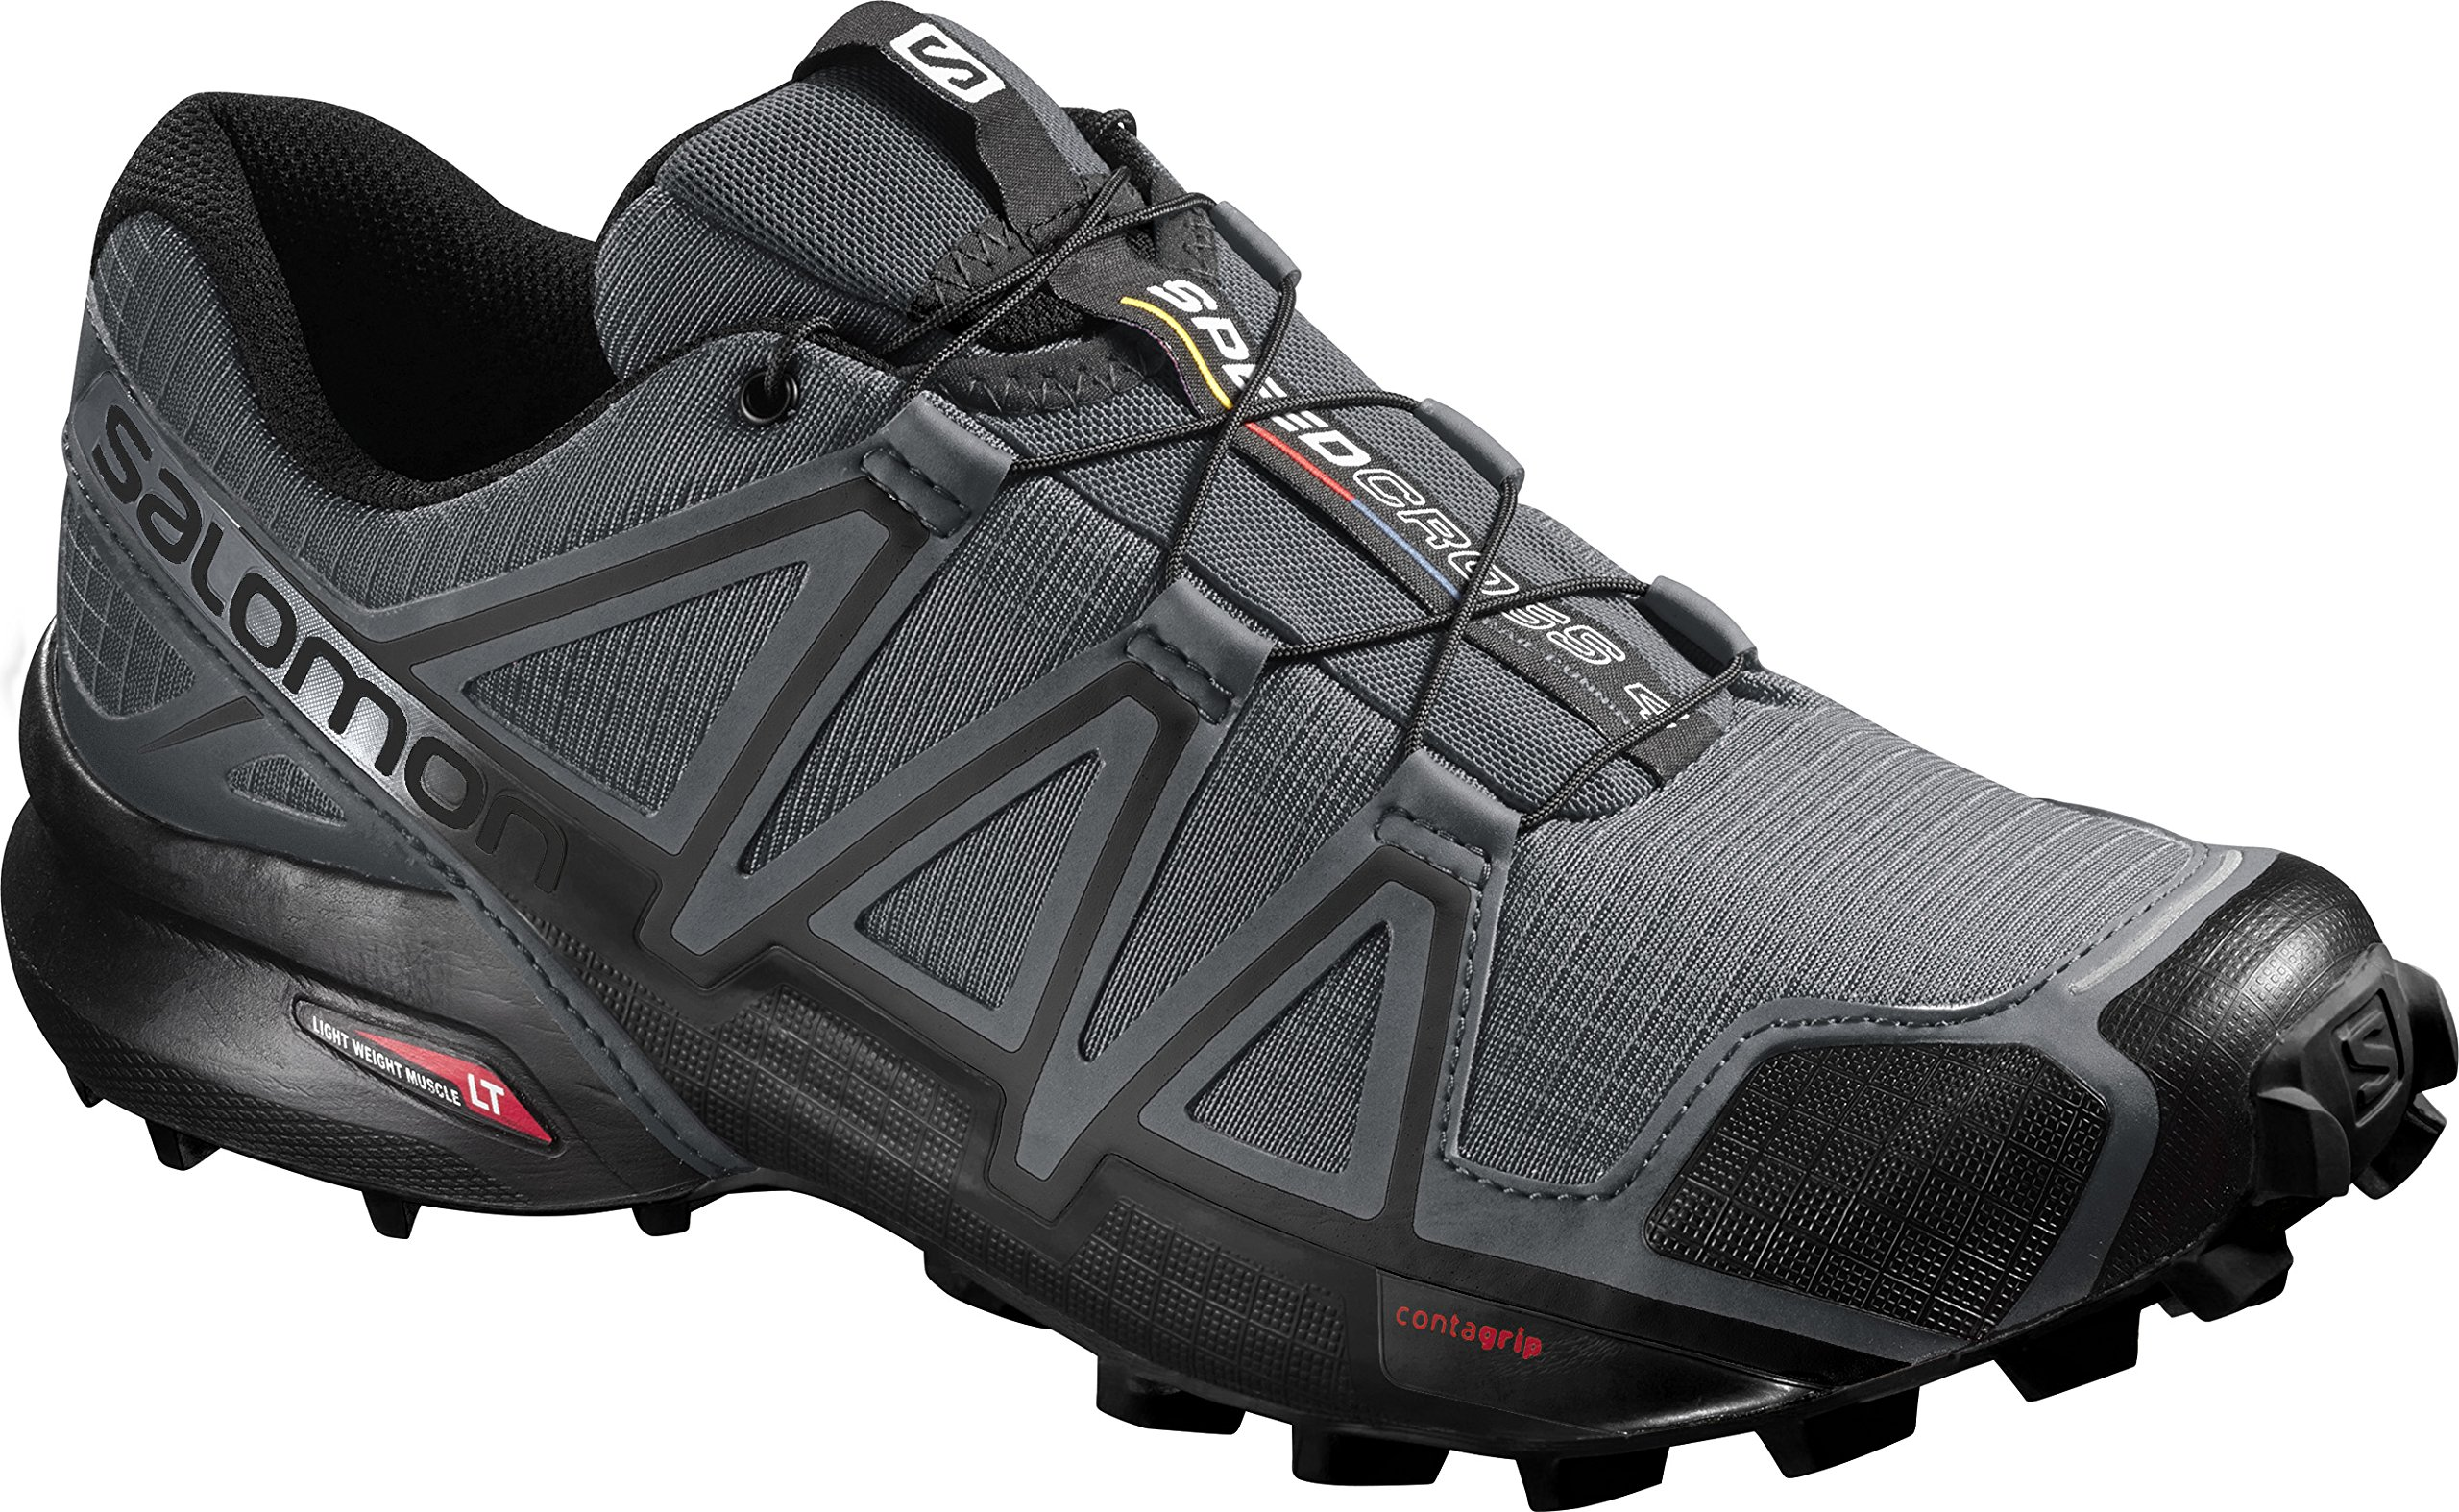 Salomon Men's Speedcross 4 Trail Runner, Dark Cloud, 7 M US by Salomon (Image #15)